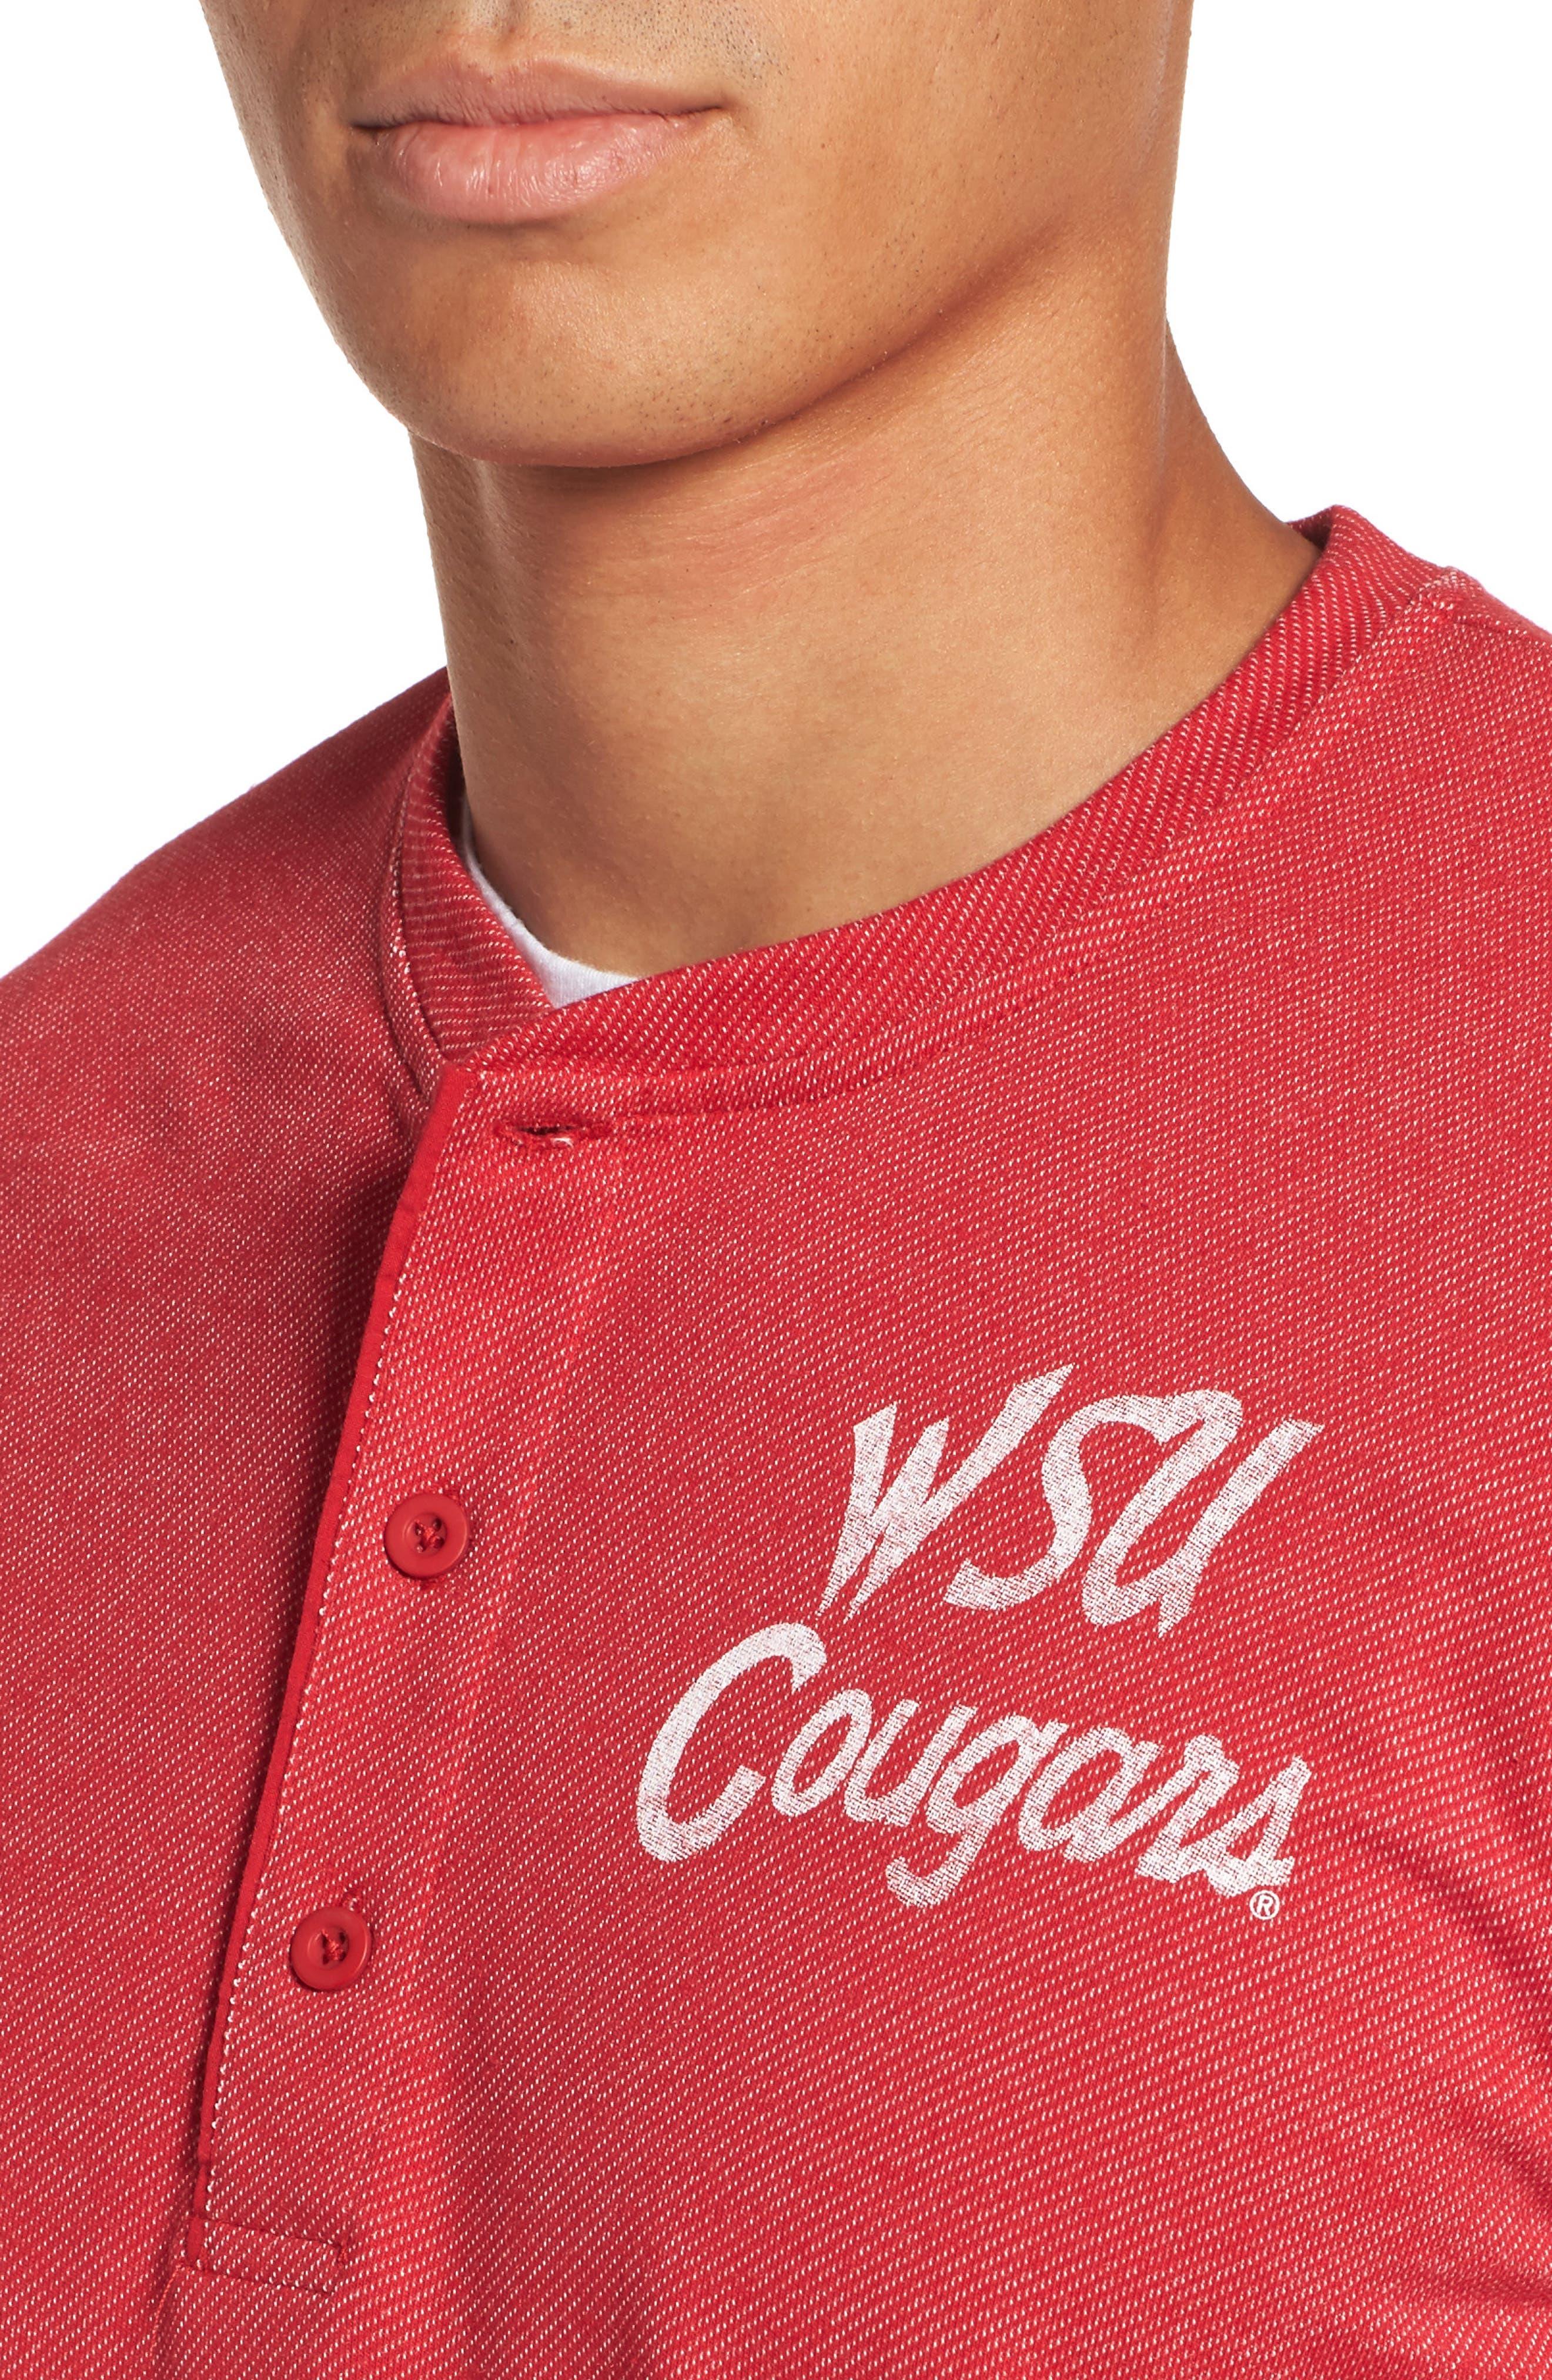 Washington State University Cougars Henley,                             Alternate thumbnail 4, color,                             600